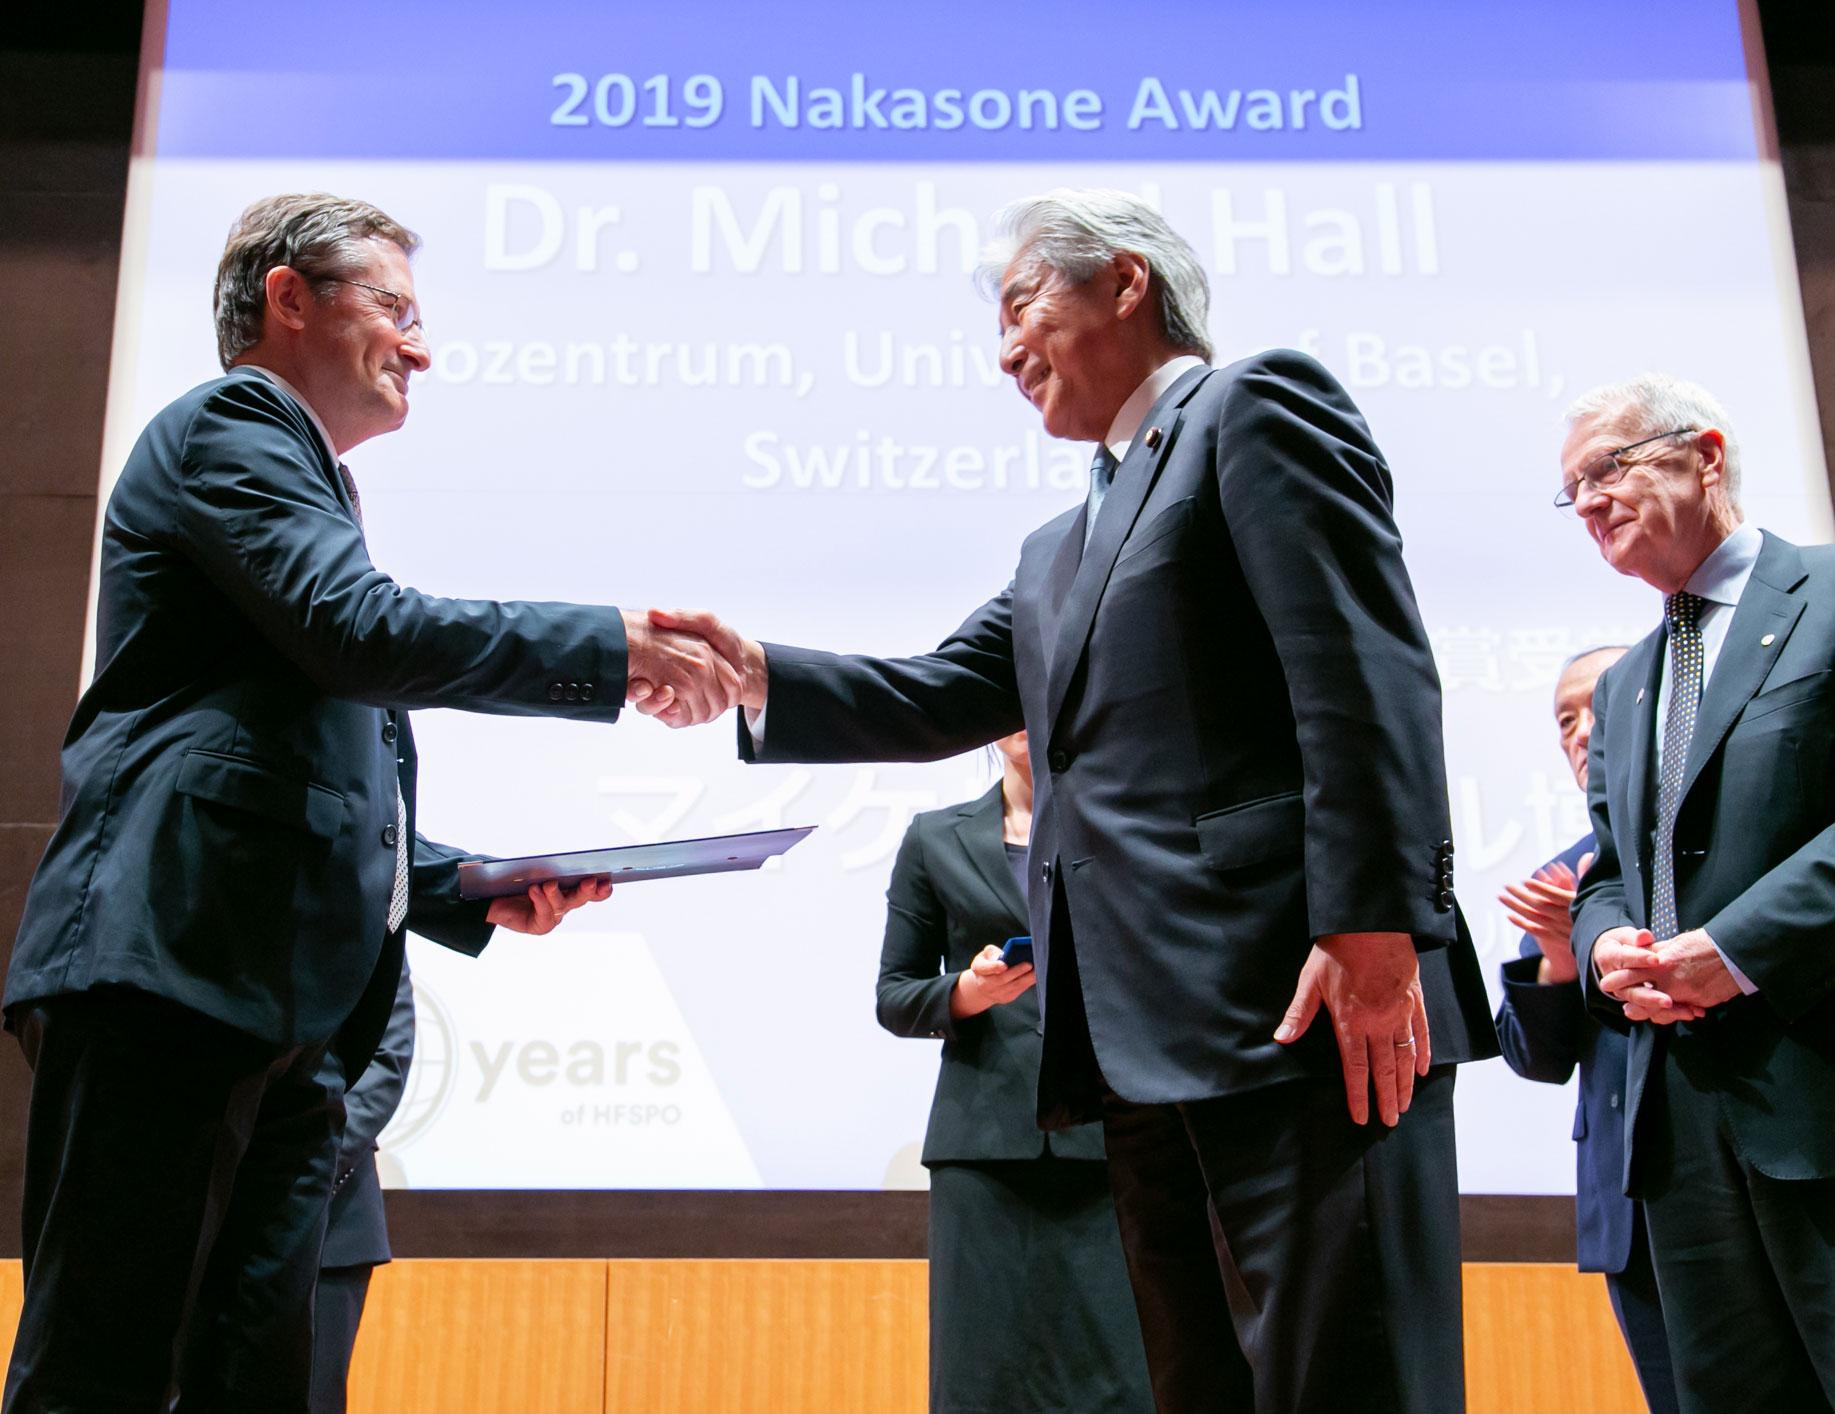 2019 HFSP Nakasone Award Ceremony